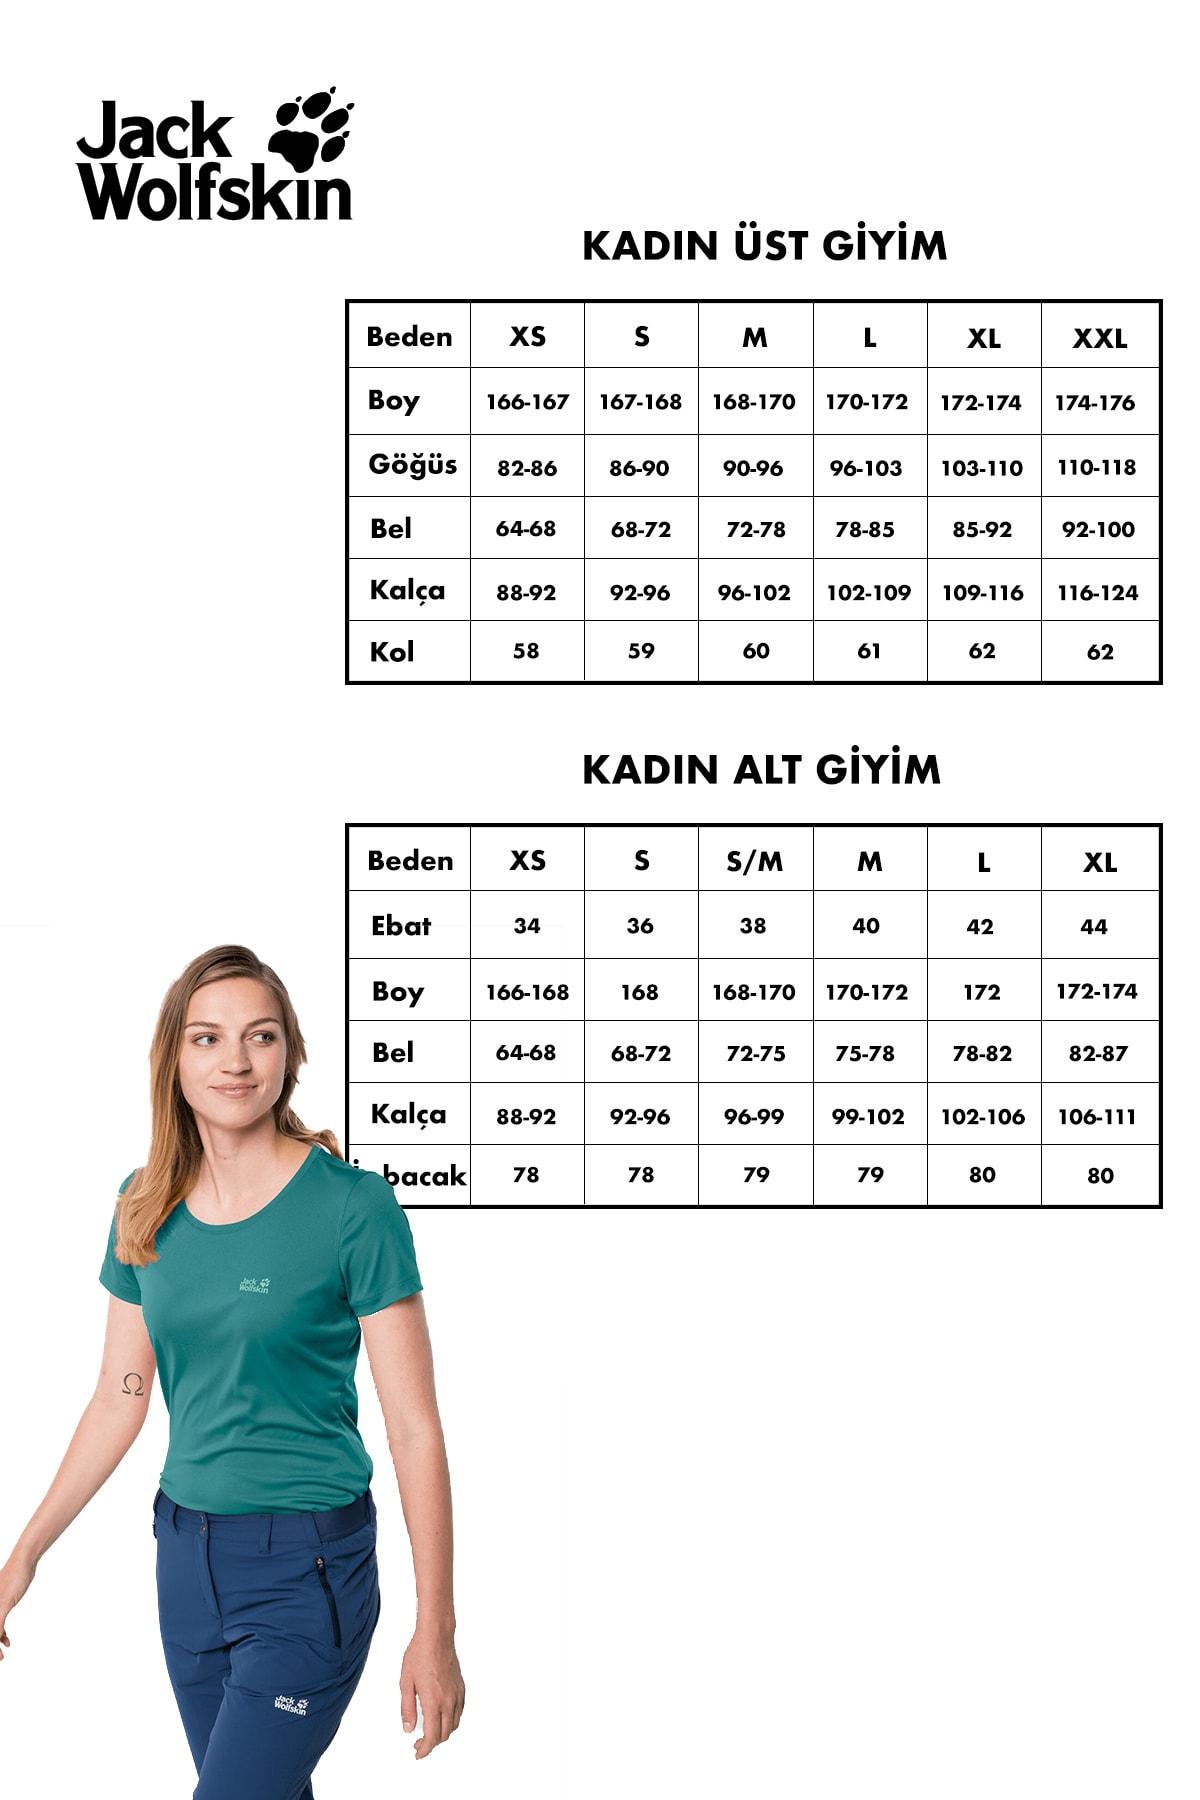 Jack Wolfskin Crosstrail Kadın T-shirt - 1801692-3075 2